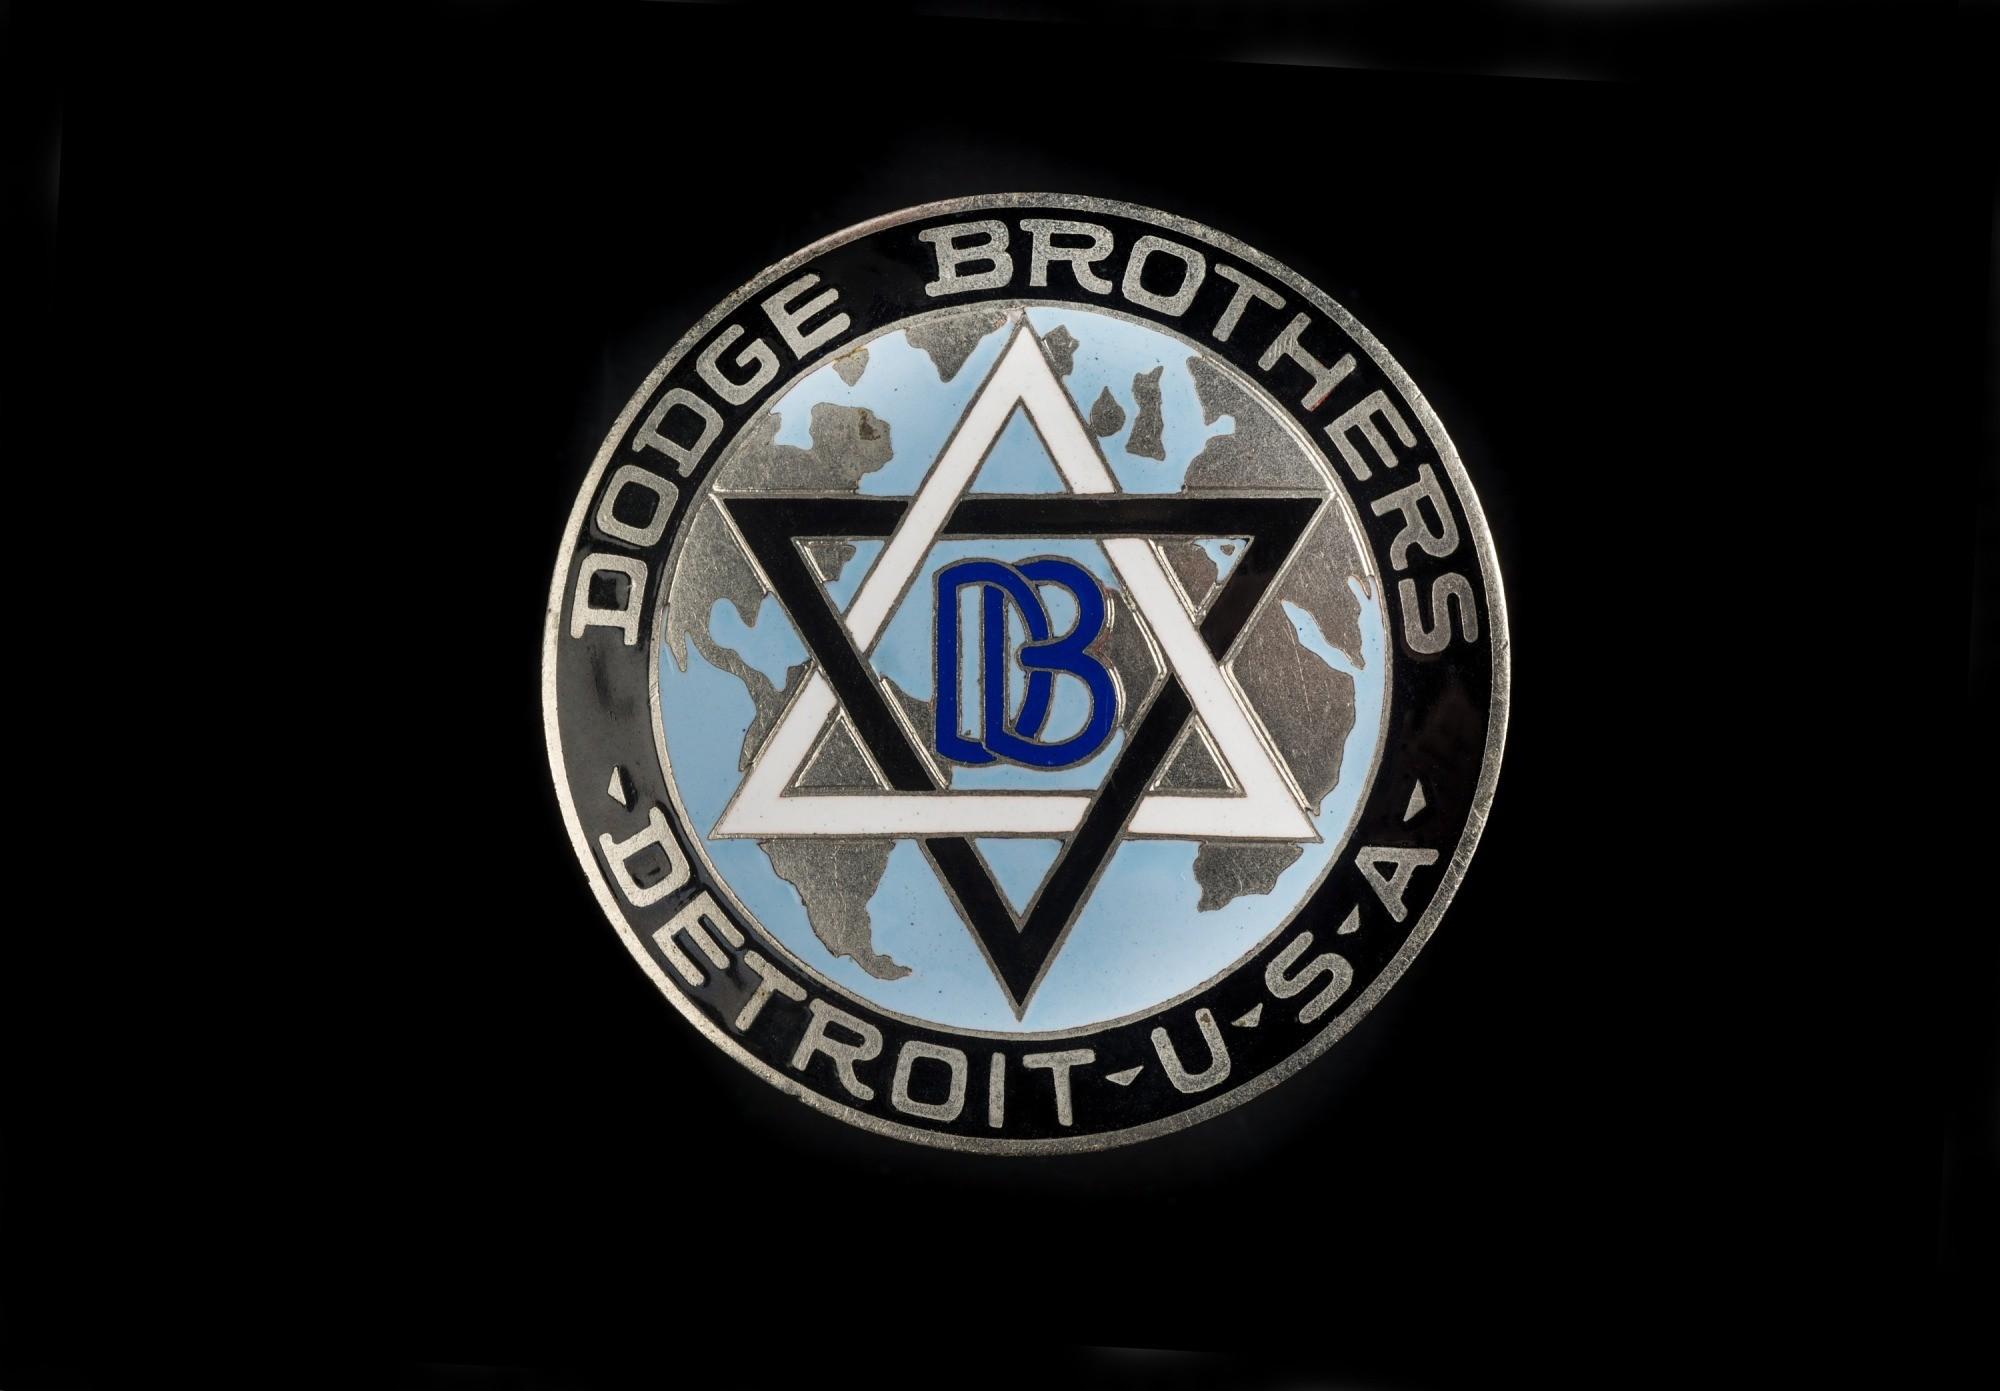 dodge brothers emblem star of david Dodge Brothers Radiator Emblem  National Museum of American History - dodge brothers emblem star of david